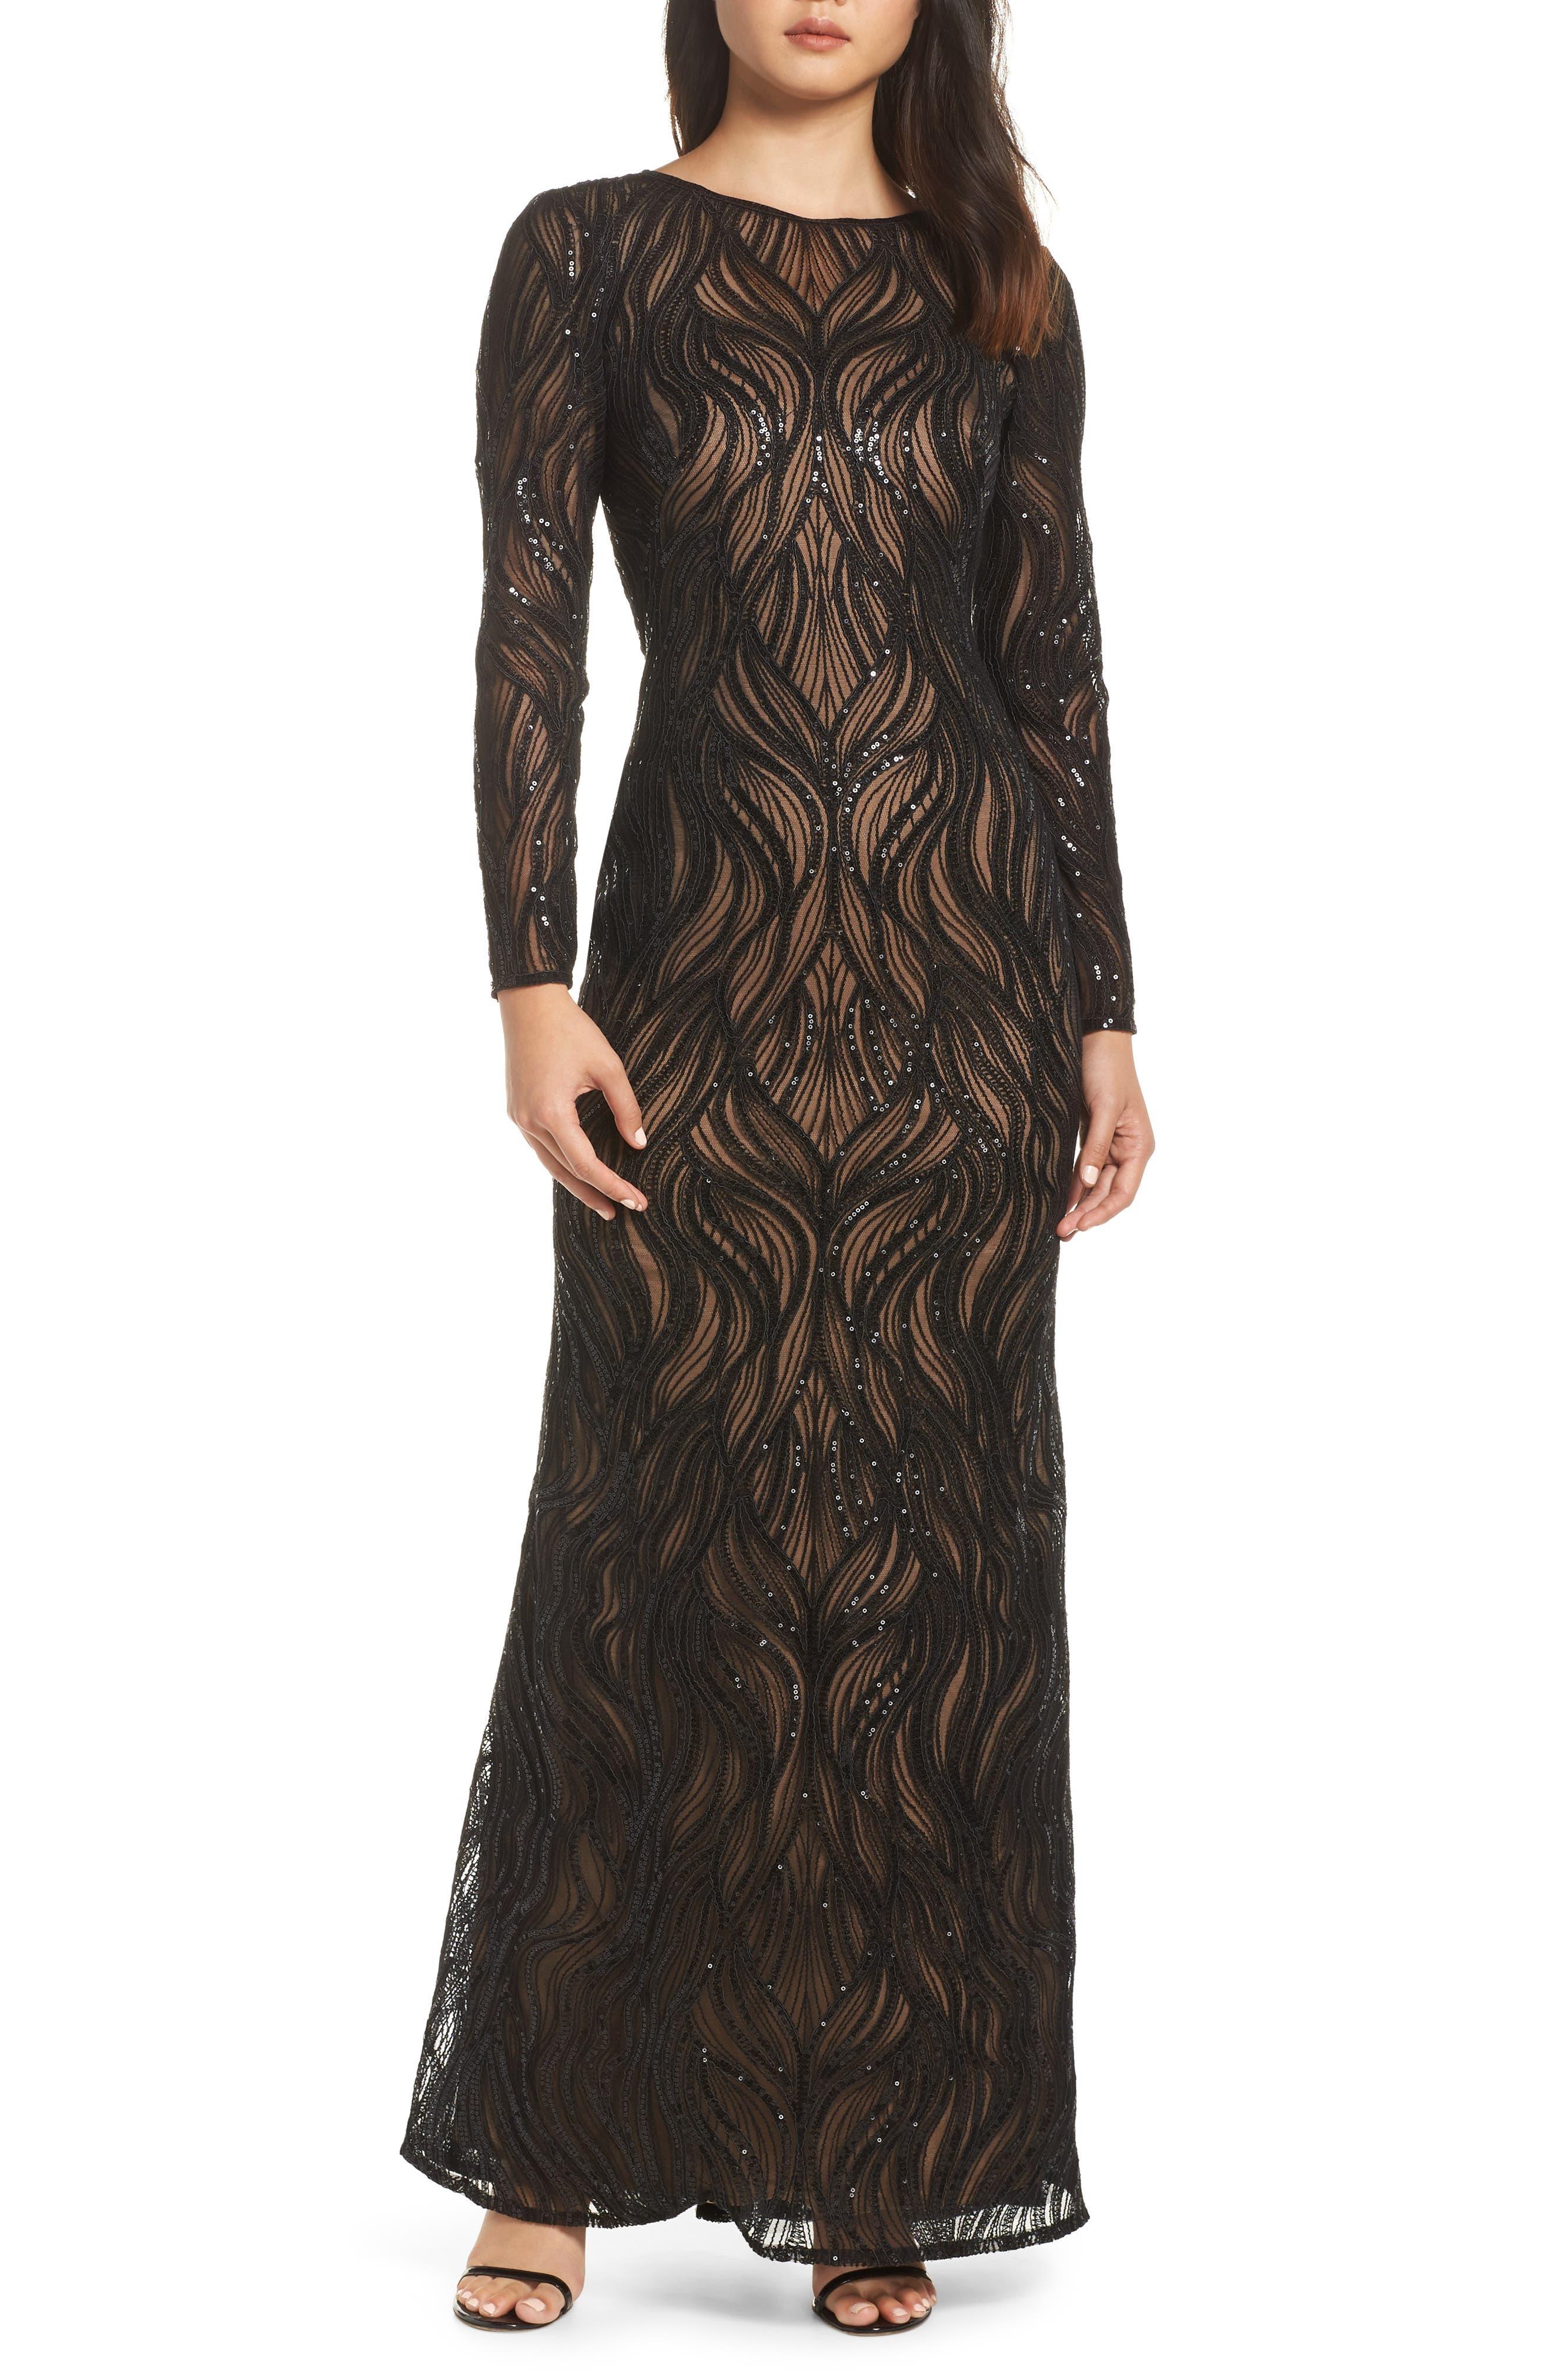 TADASHI SHOJI Long Sleeve Sequined Mesh Evening Dress, Main, color, 001